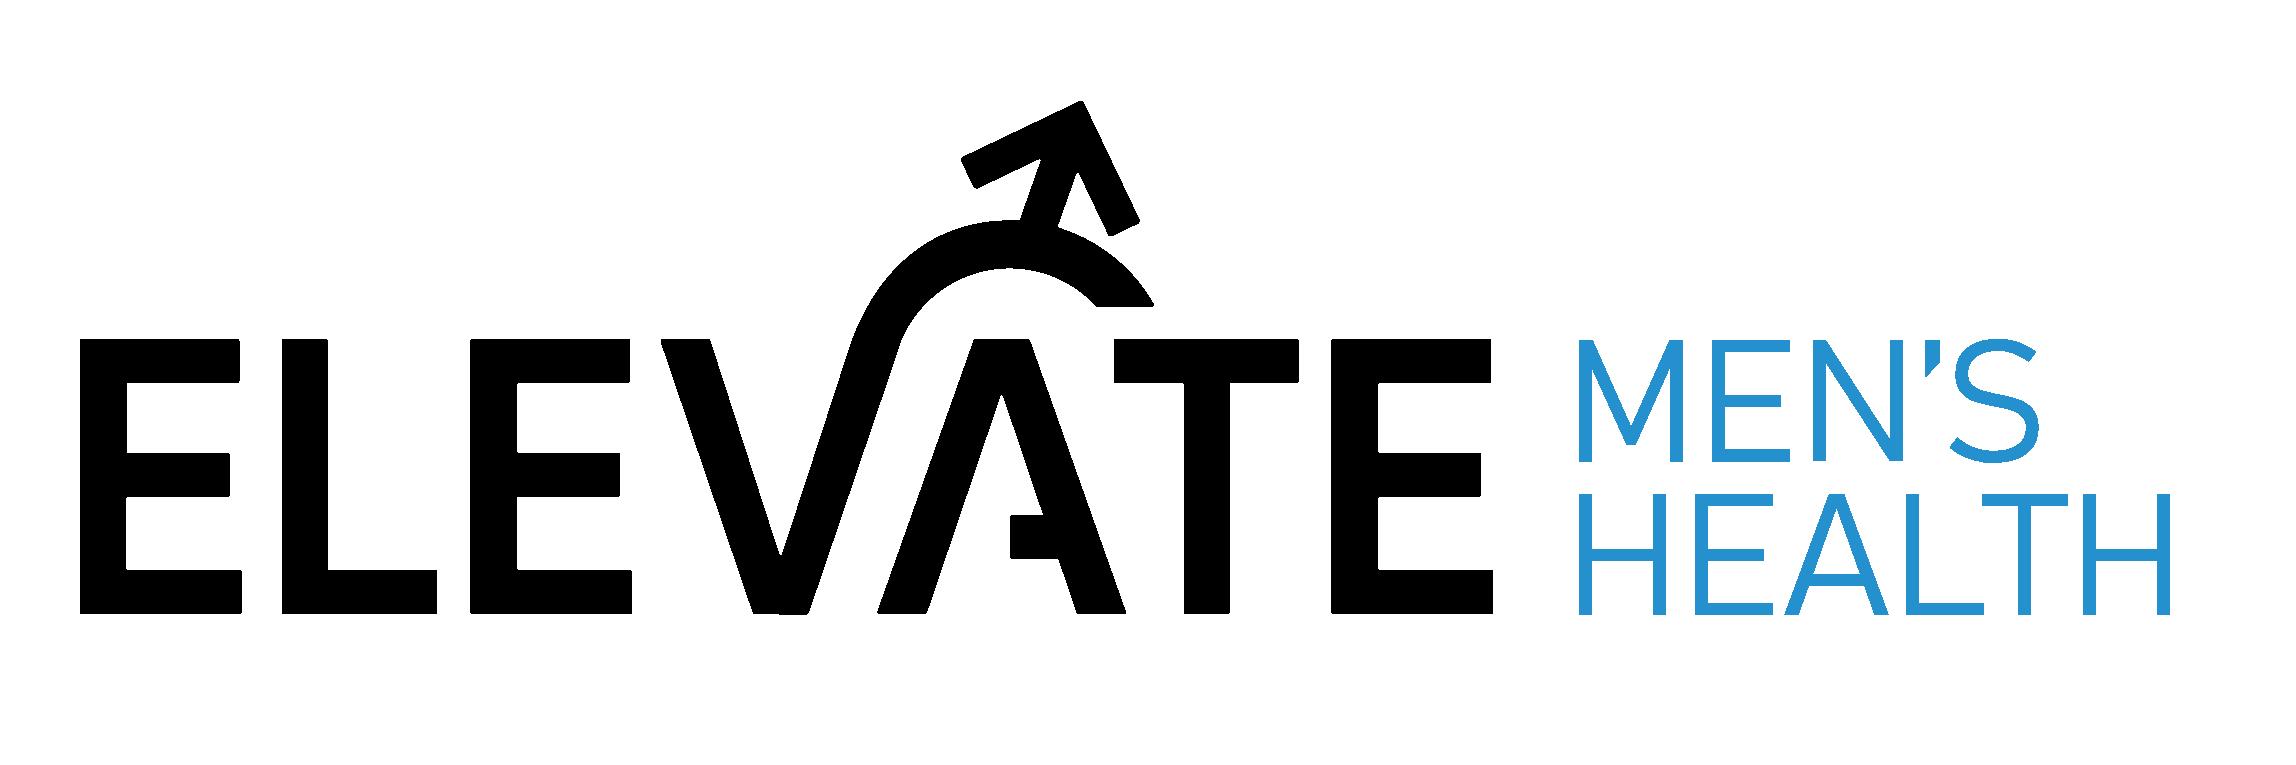 elevate mens health logo black cyan